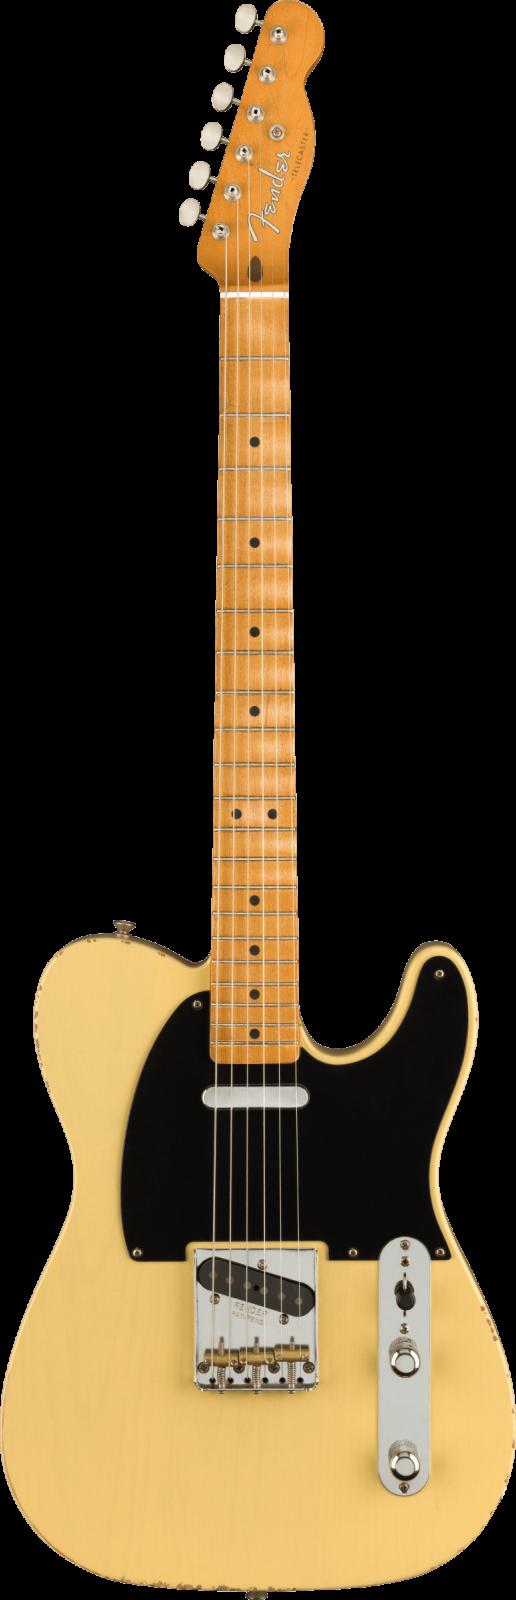 Fender Vintera Road Worn  '50s Telecaster, Maple Fingerboard, Vintage Blonde